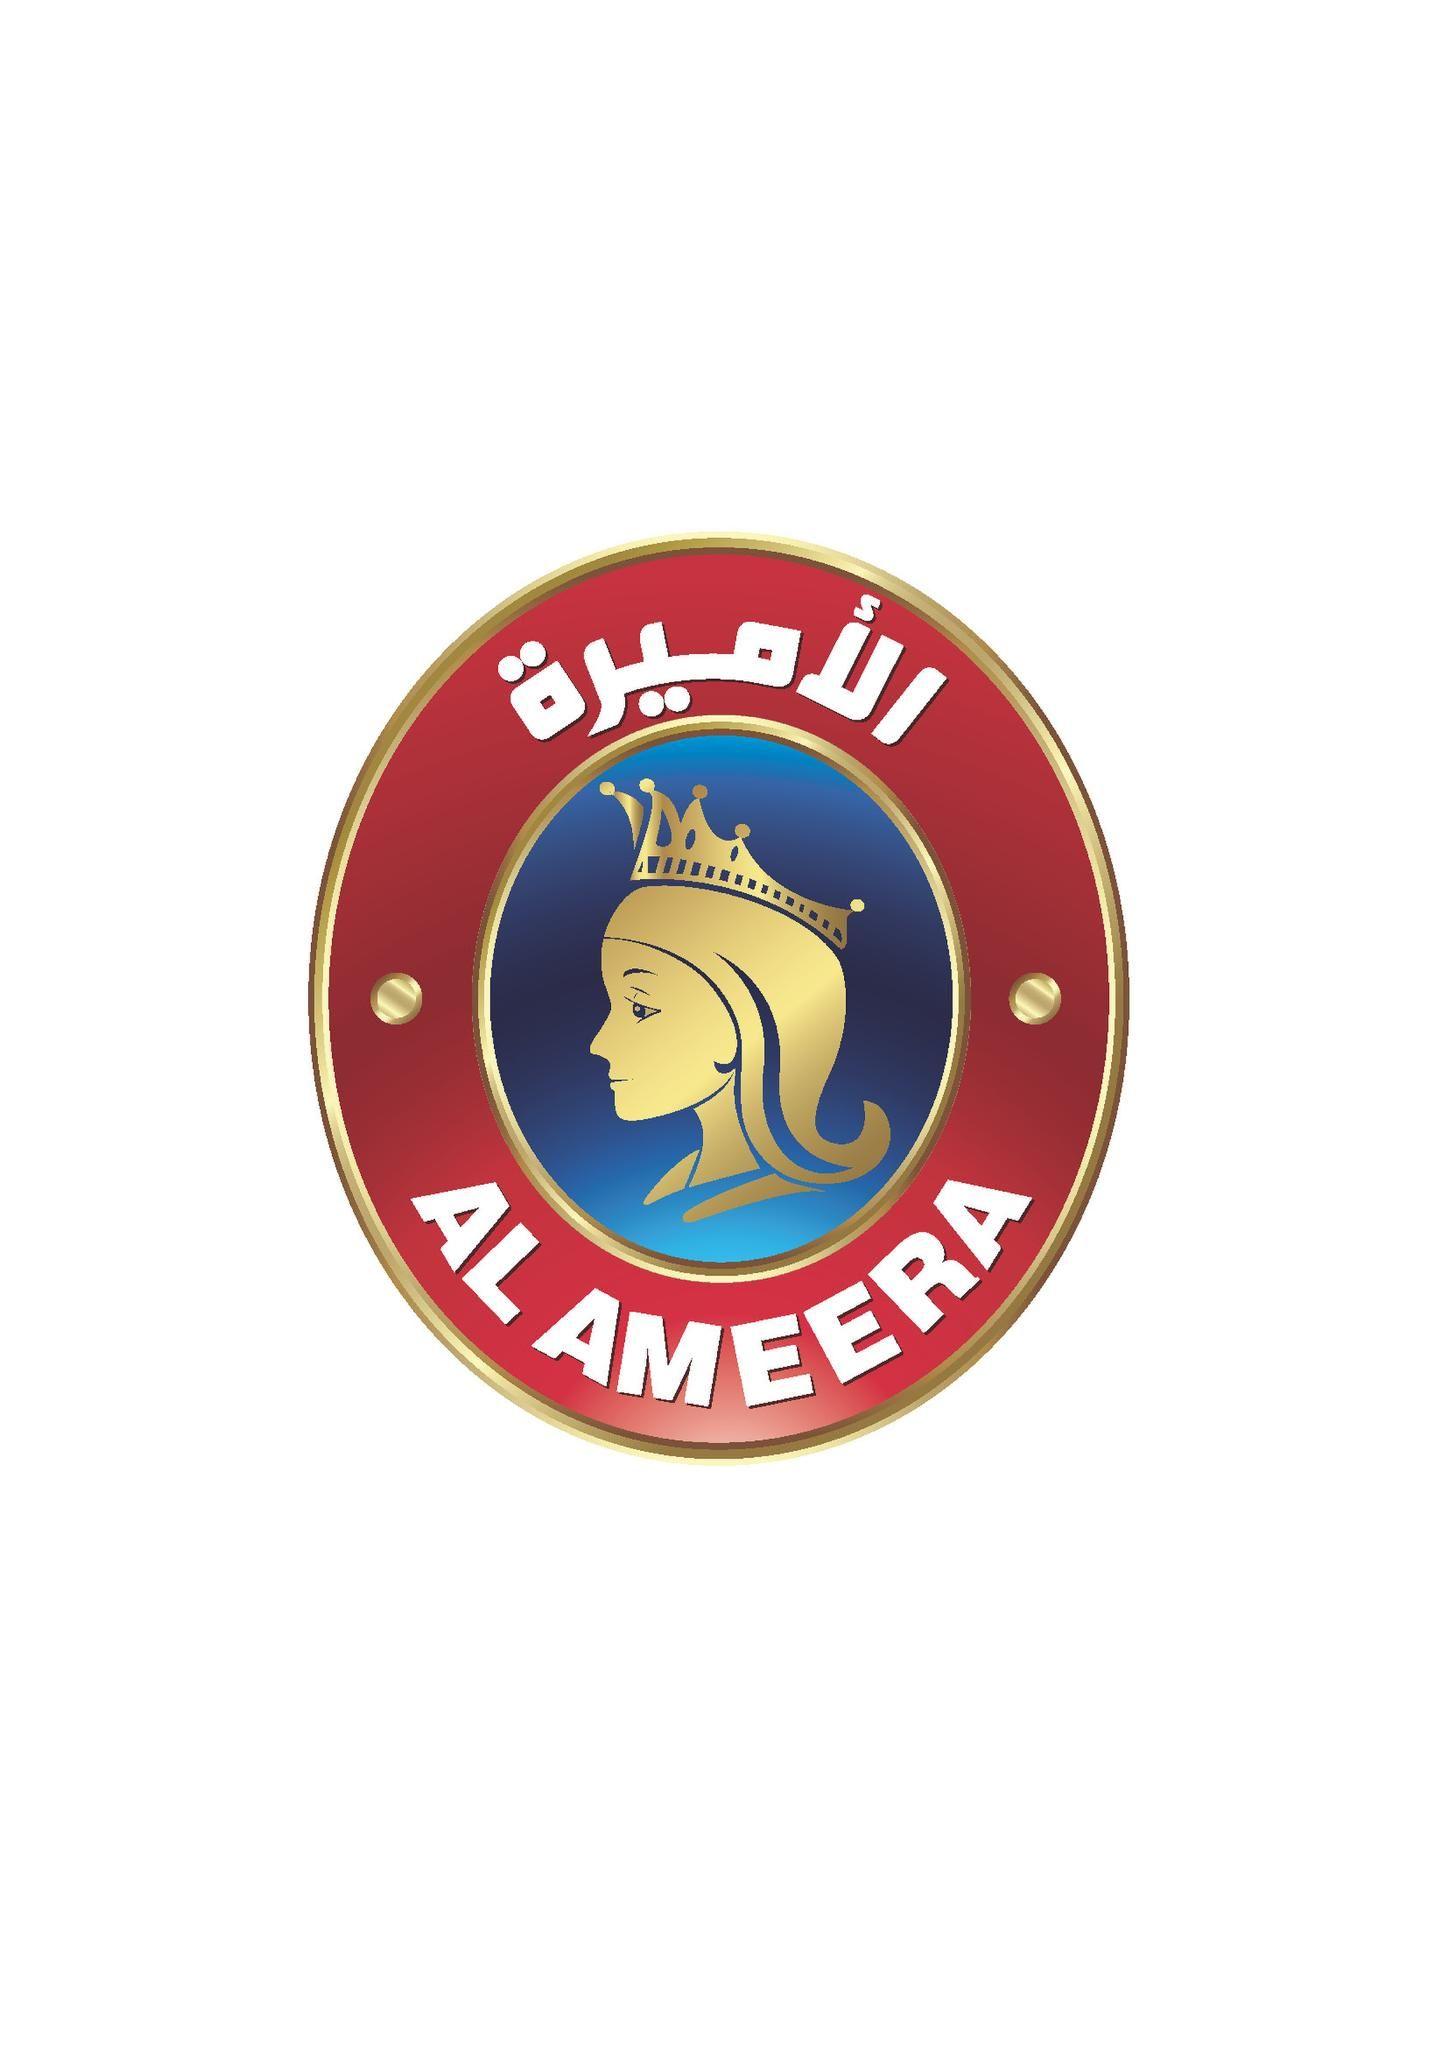 AL AMEERA HUMMUS